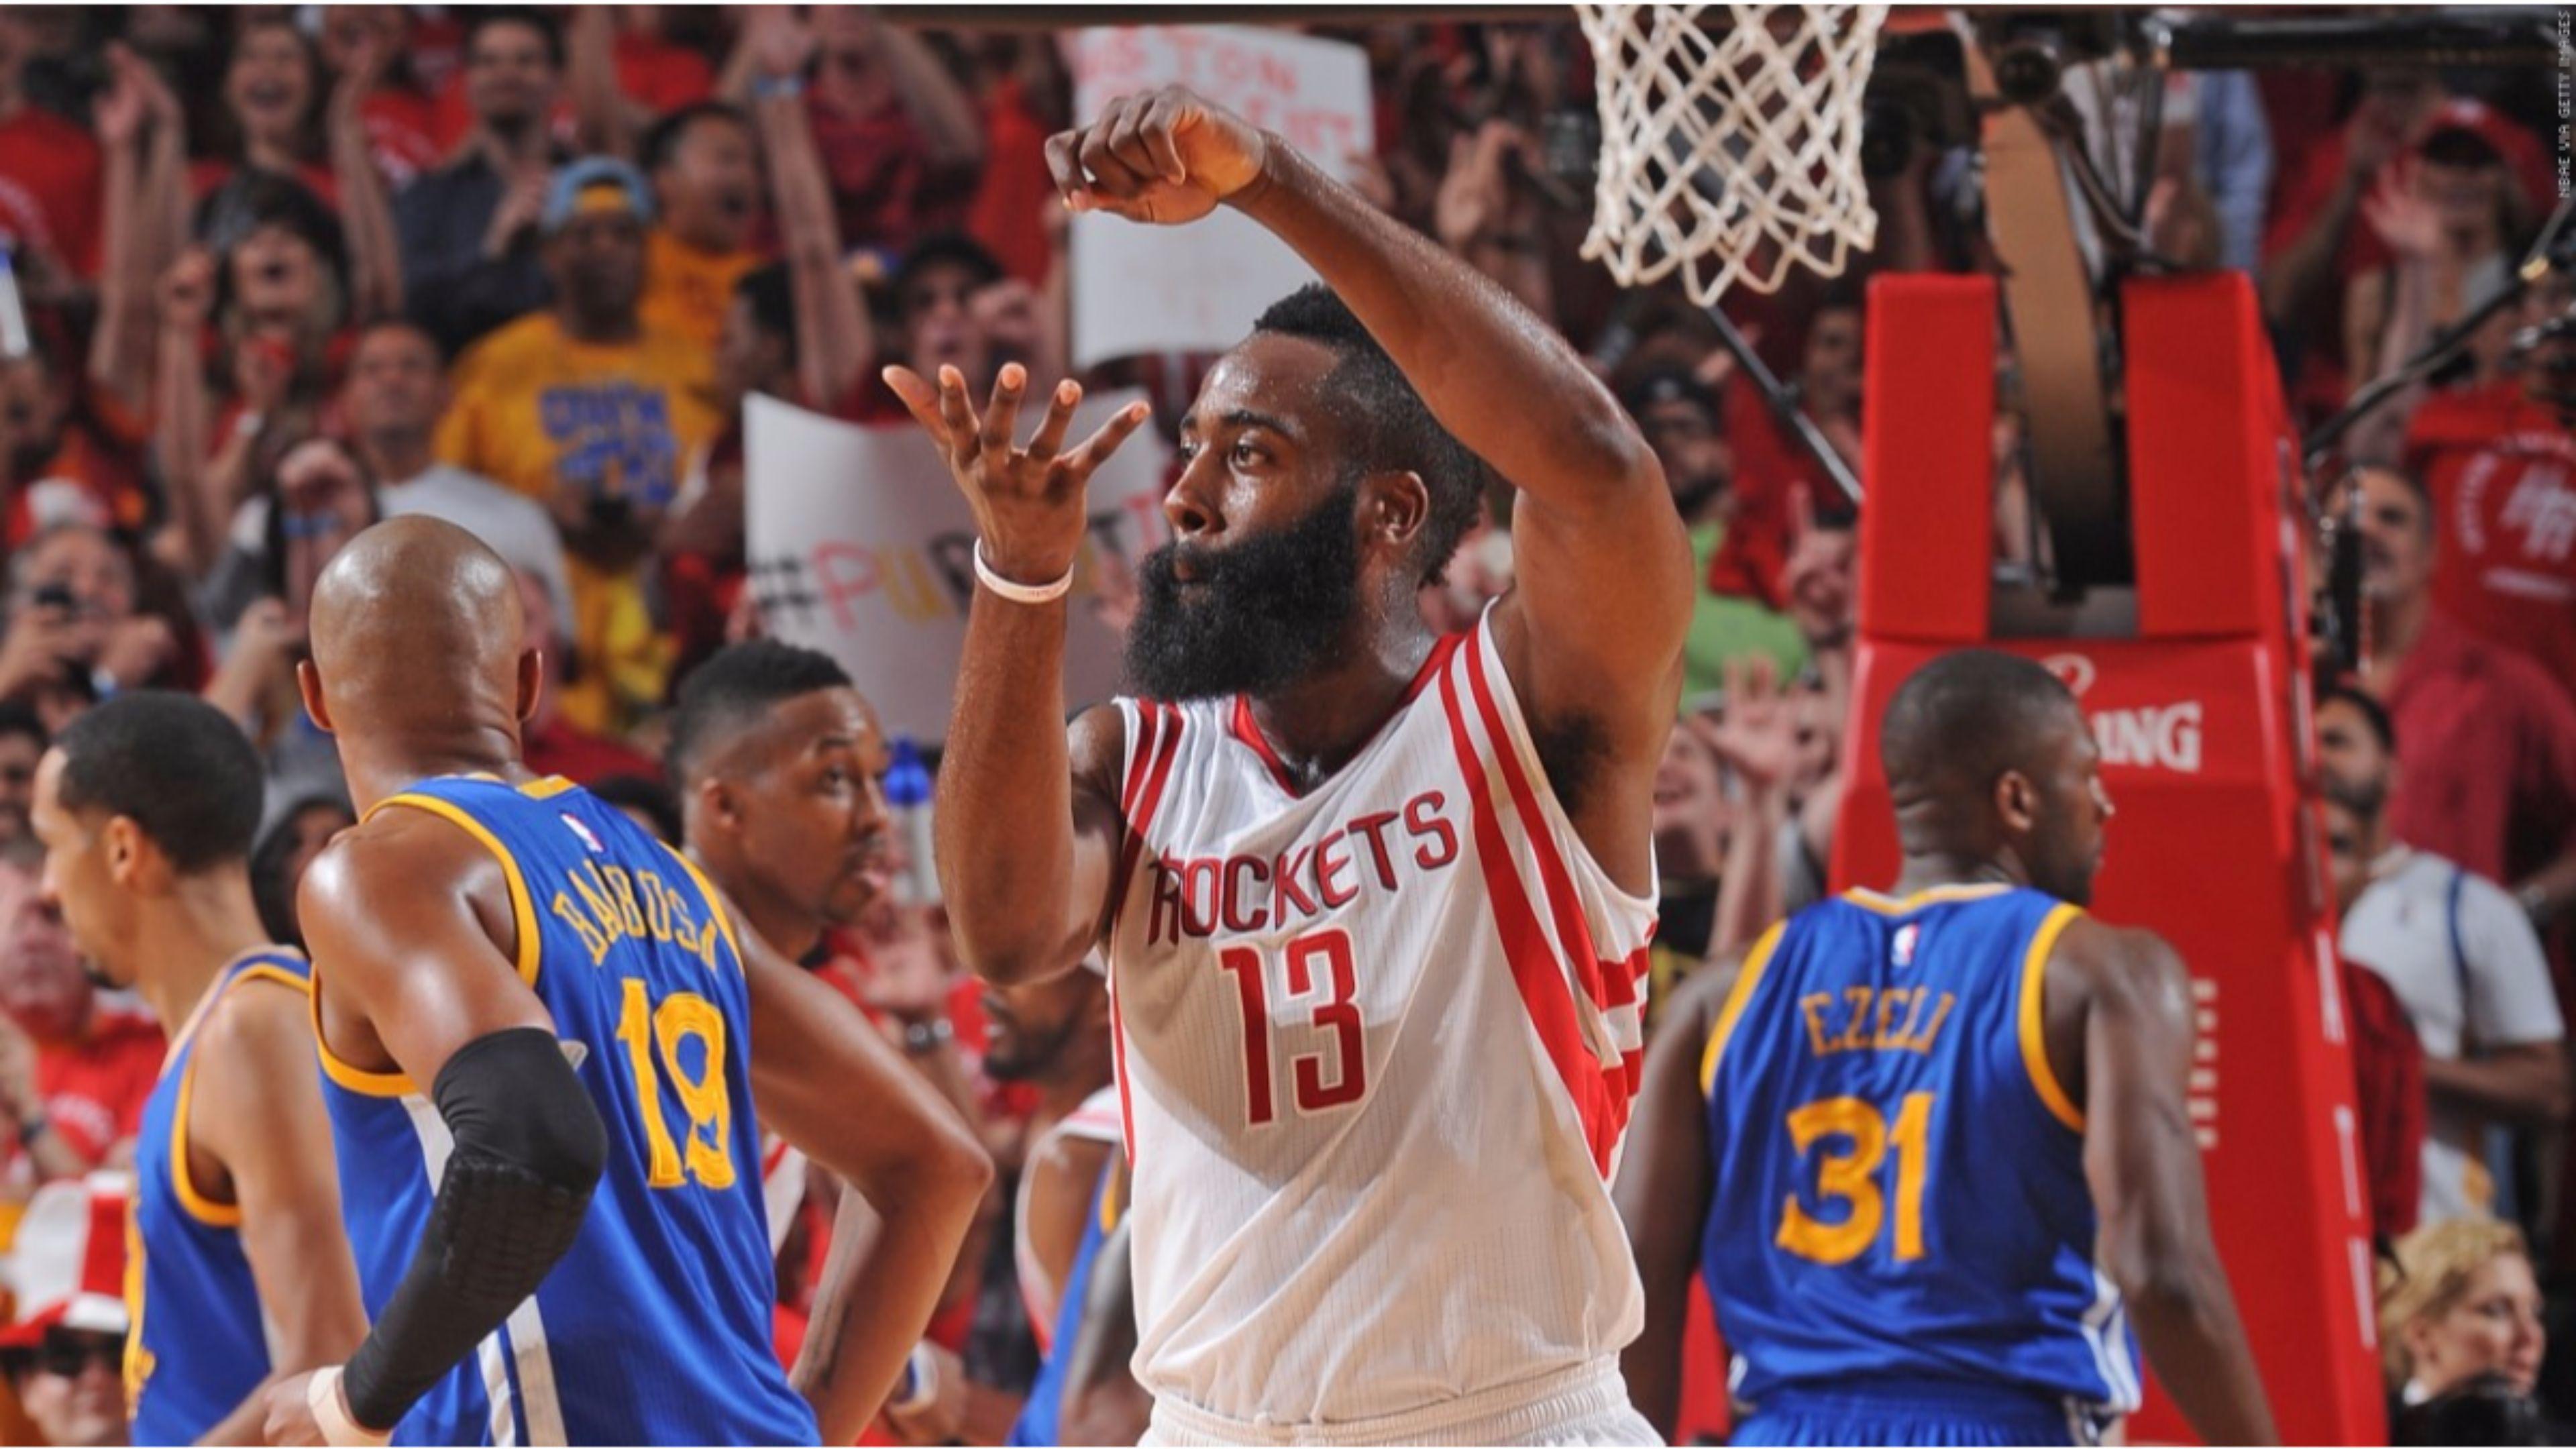 4K NBA Wallpapers   Top 4K NBA Backgrounds   WallpaperAccess 3840x2160